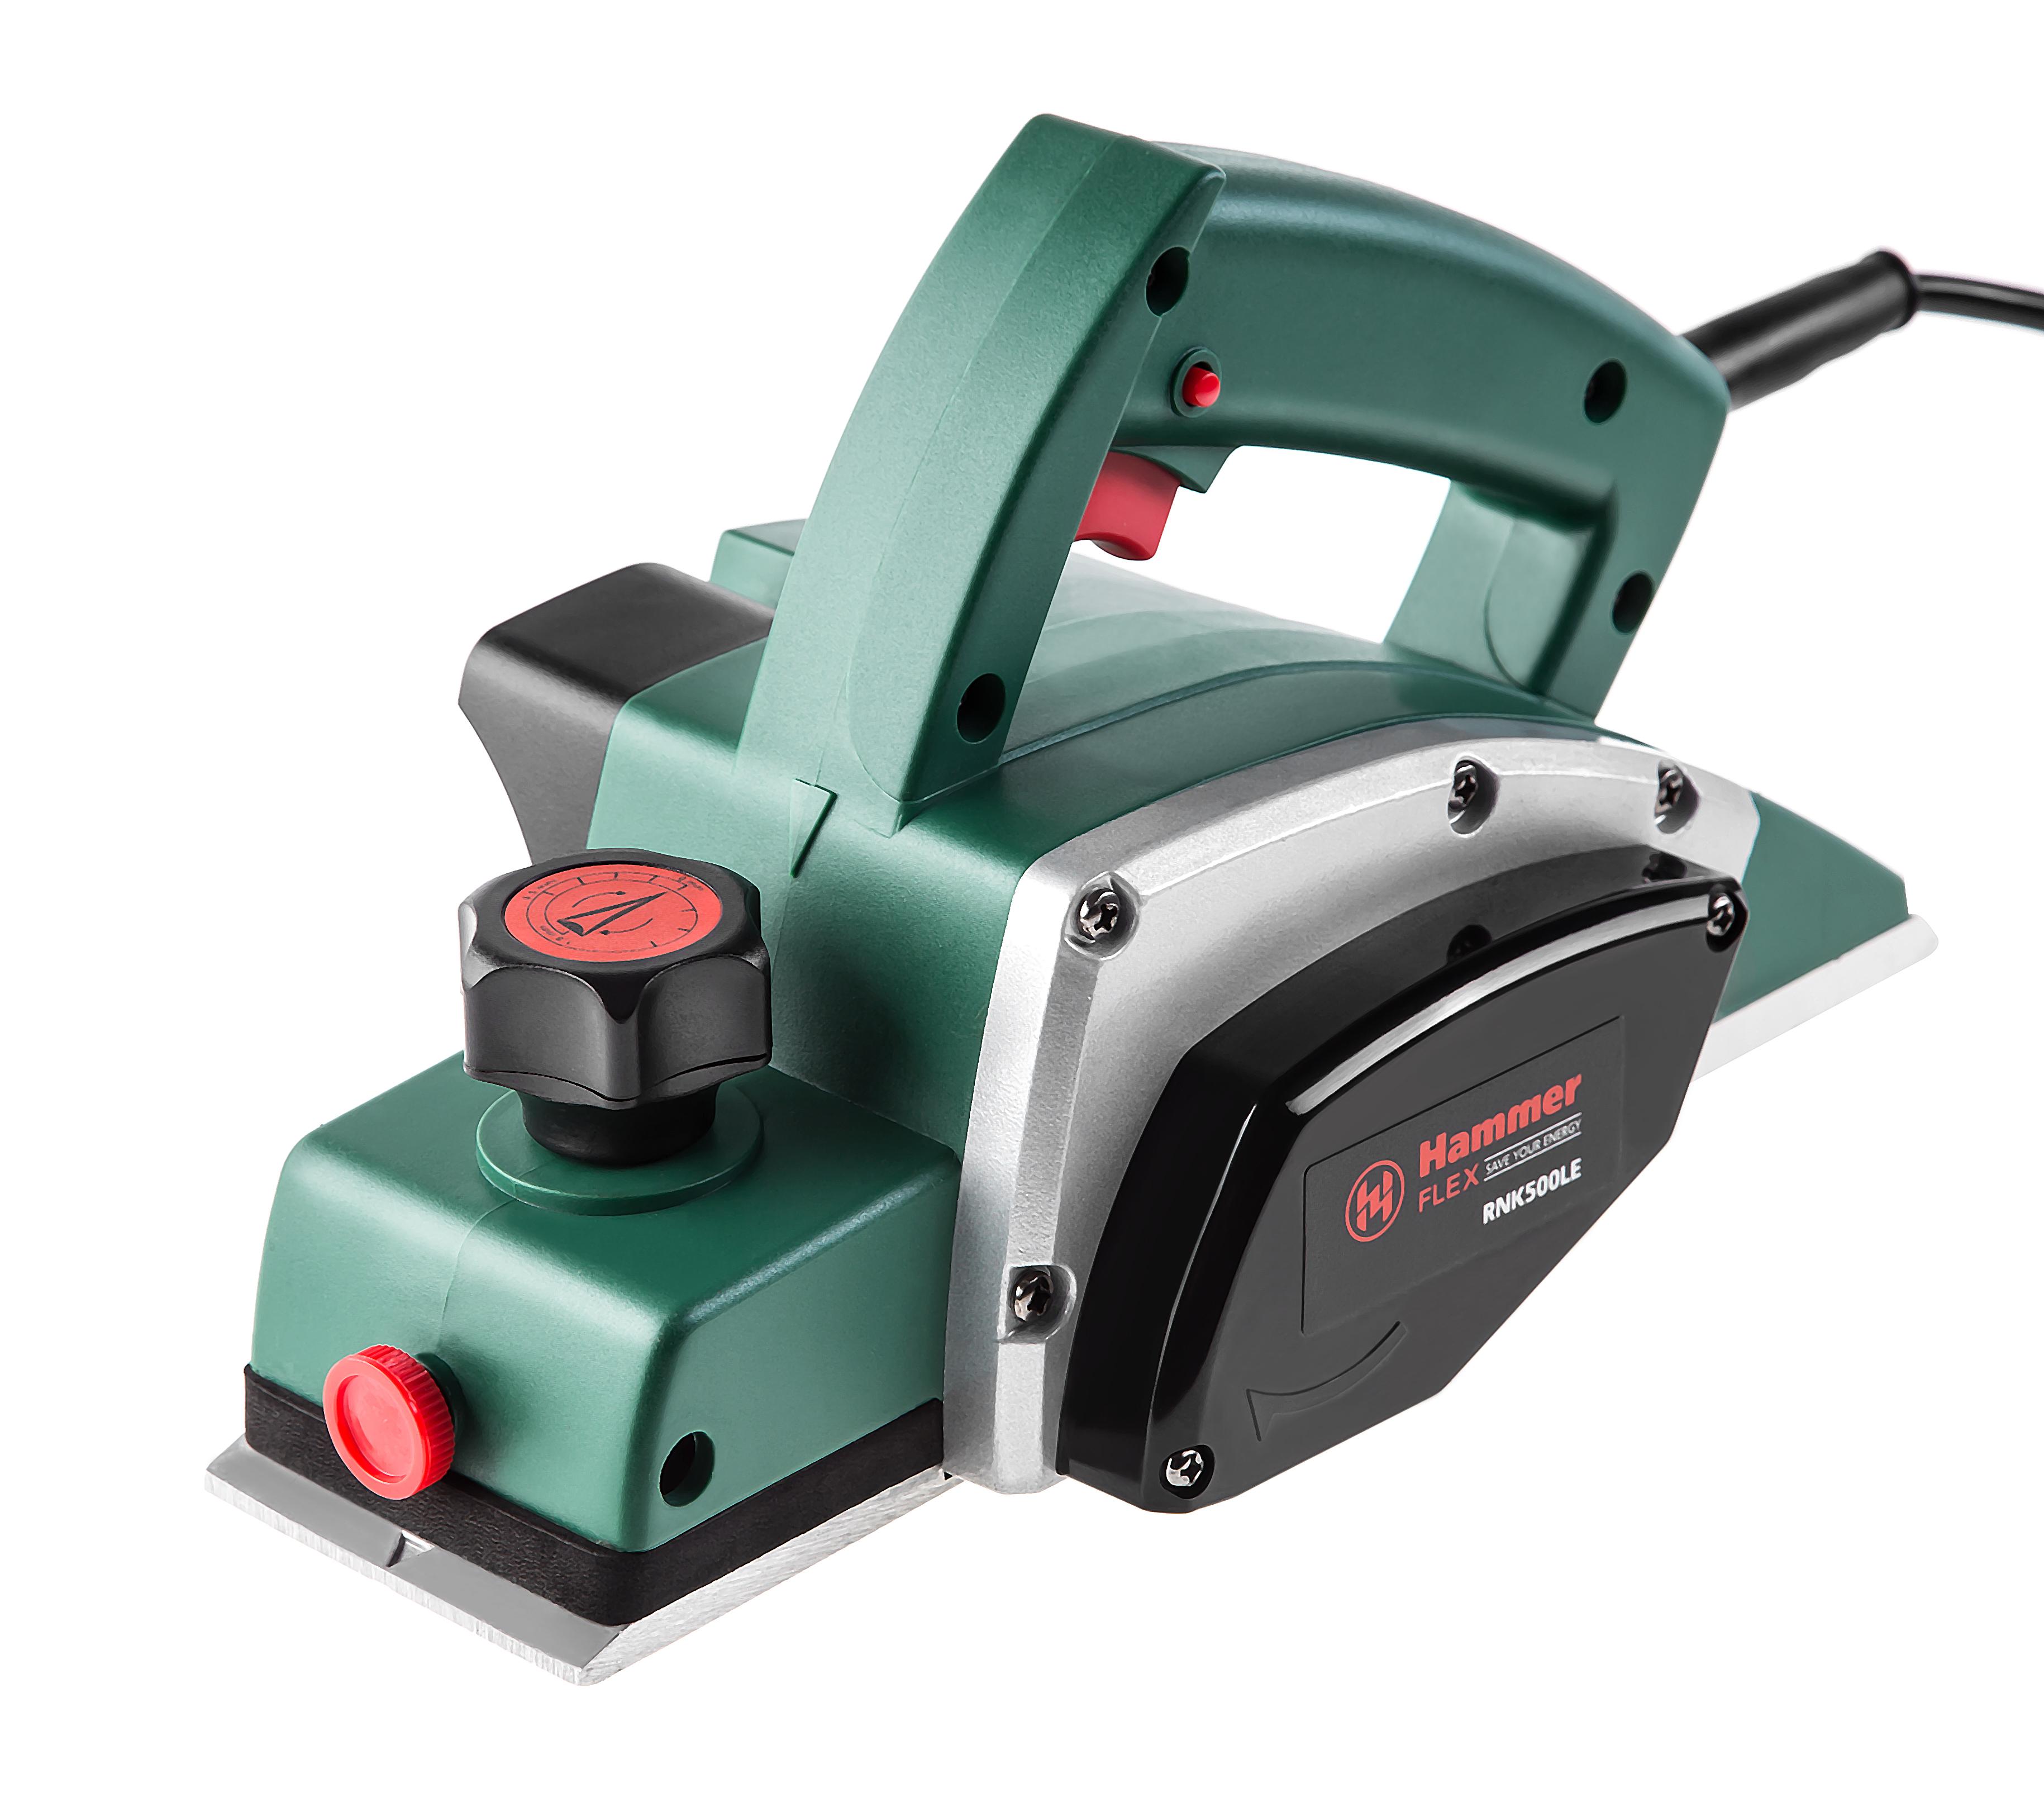 Рубанок Hammer Rnk500le